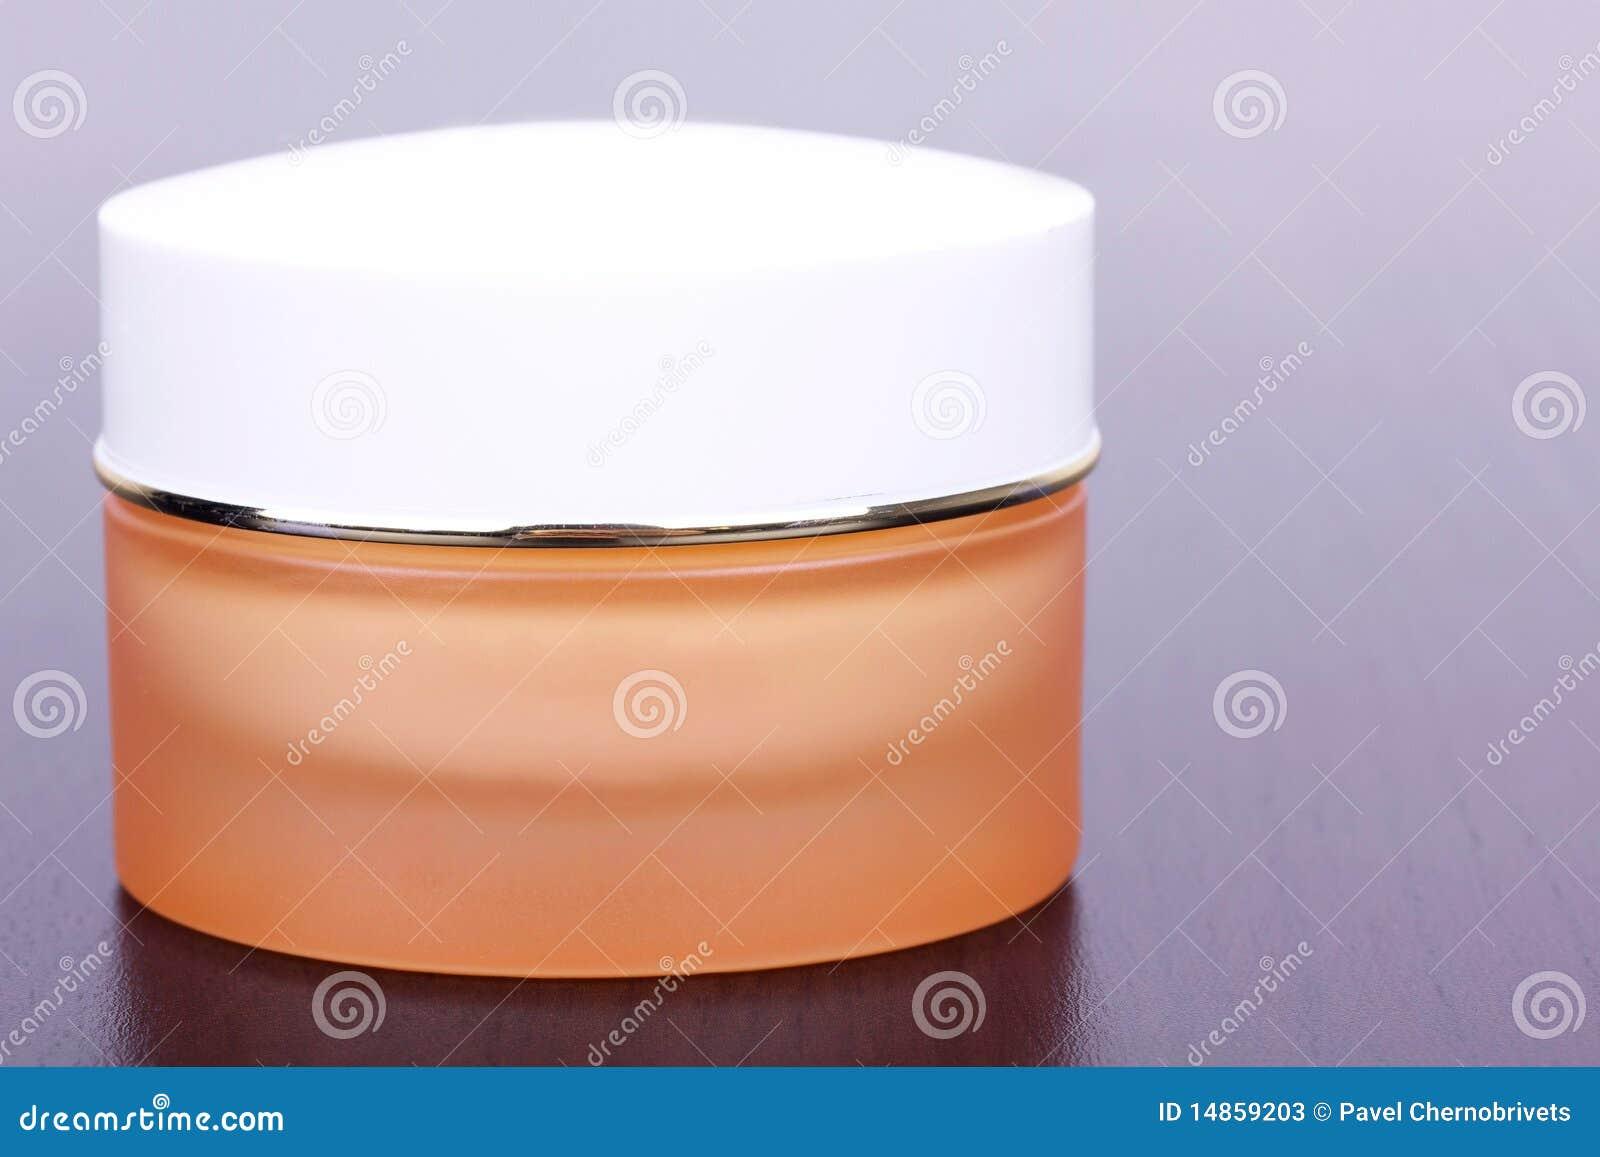 Cream in yellow box on black table